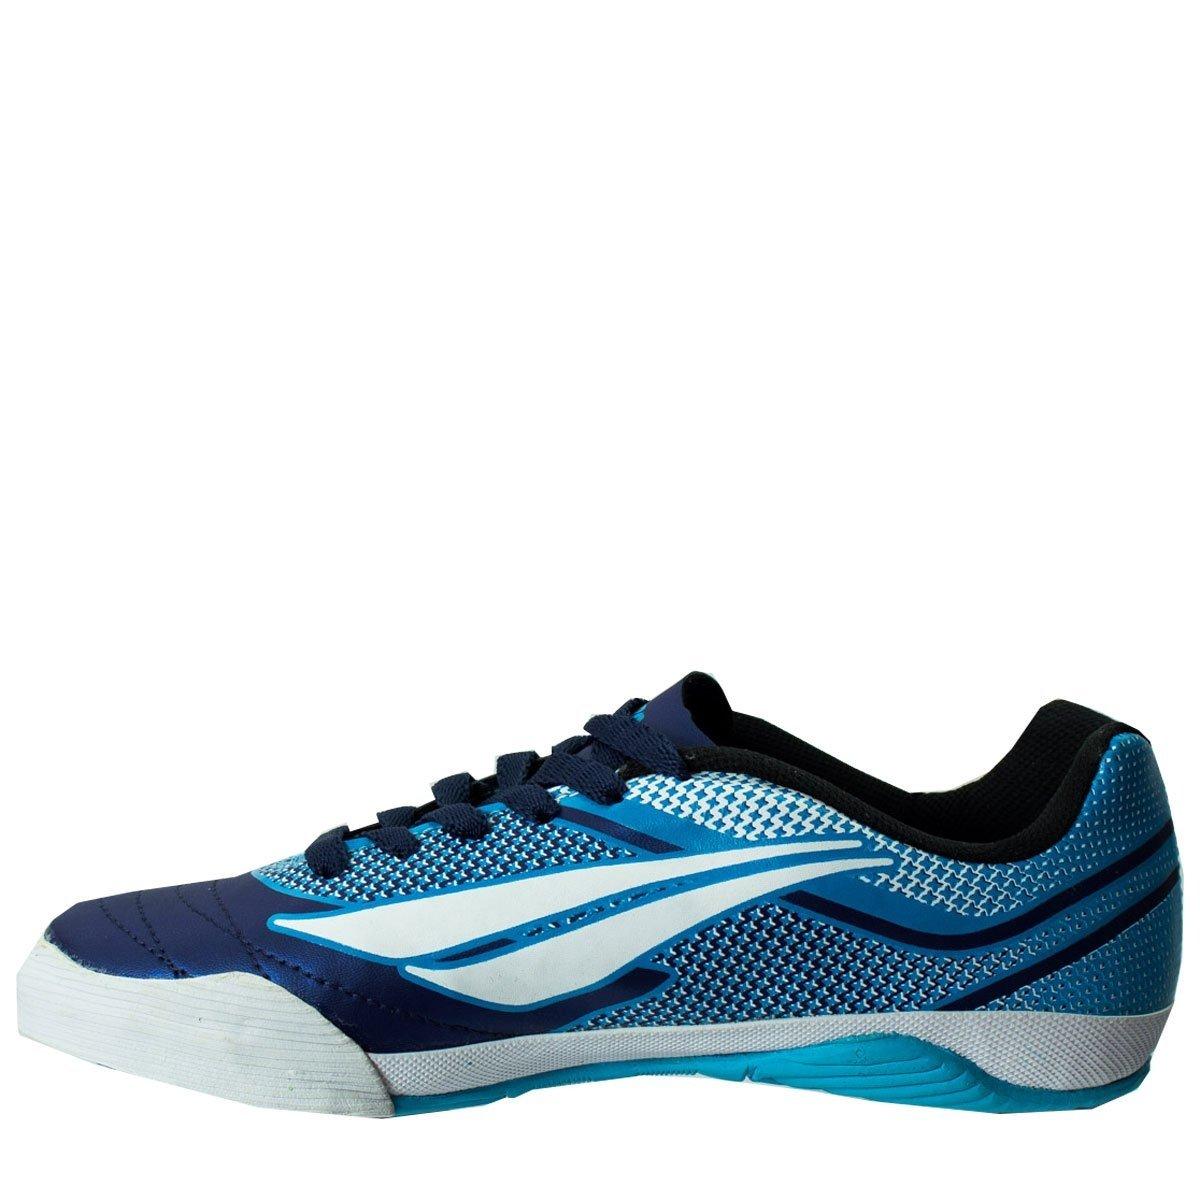 41b6857fb Chuteira Infantil Futsal Penalty ATF Rocket - Compre Agora